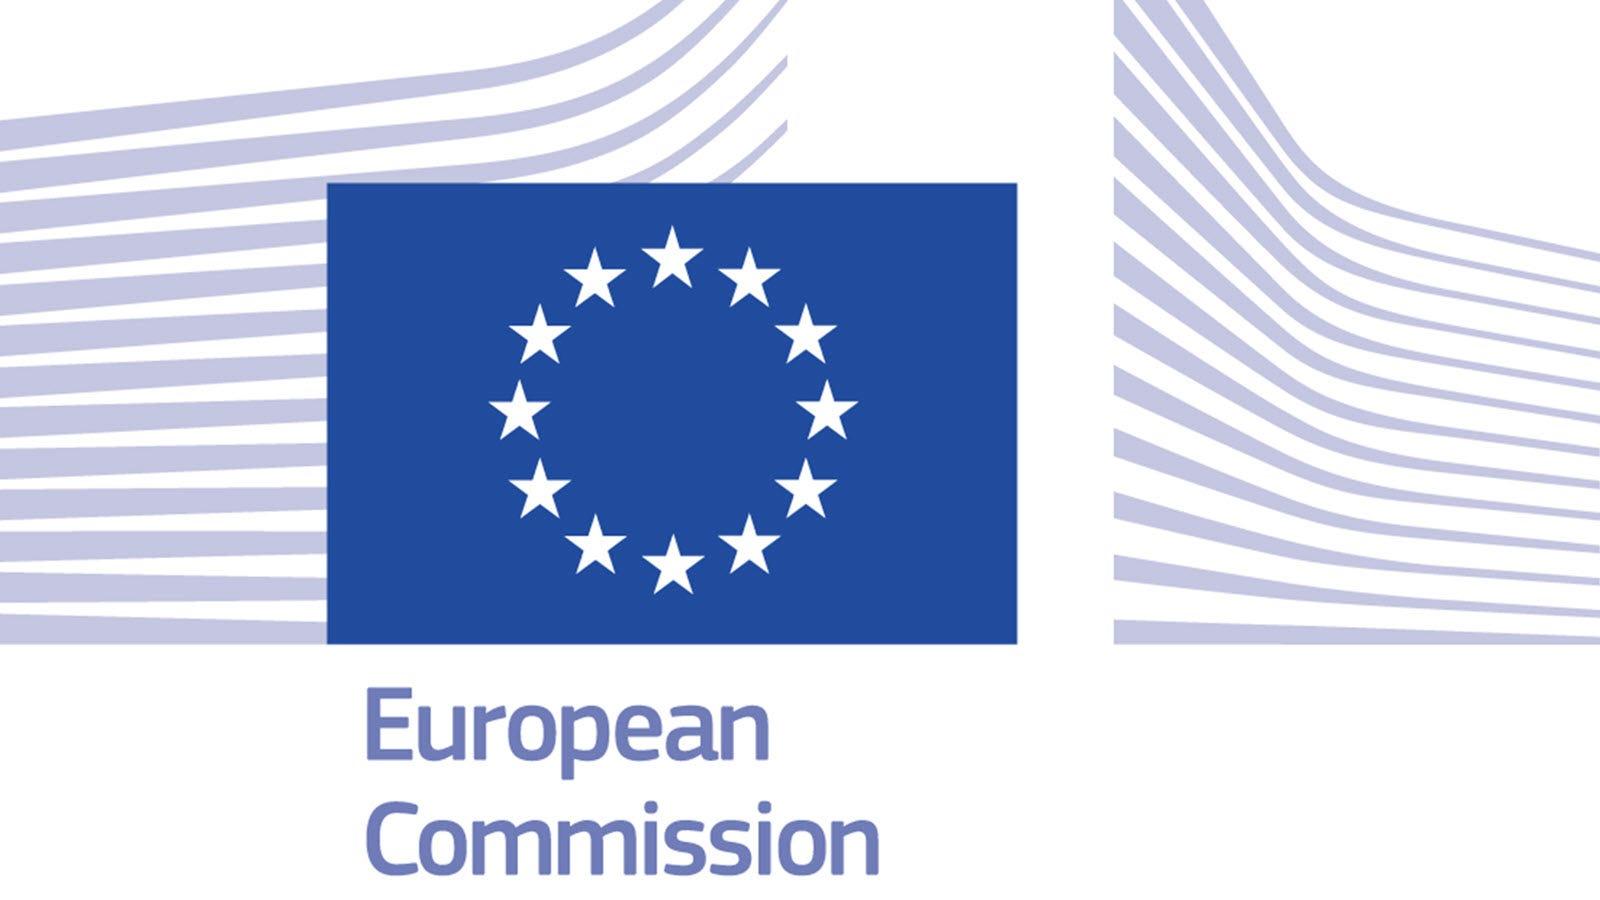 The European Commission Logo